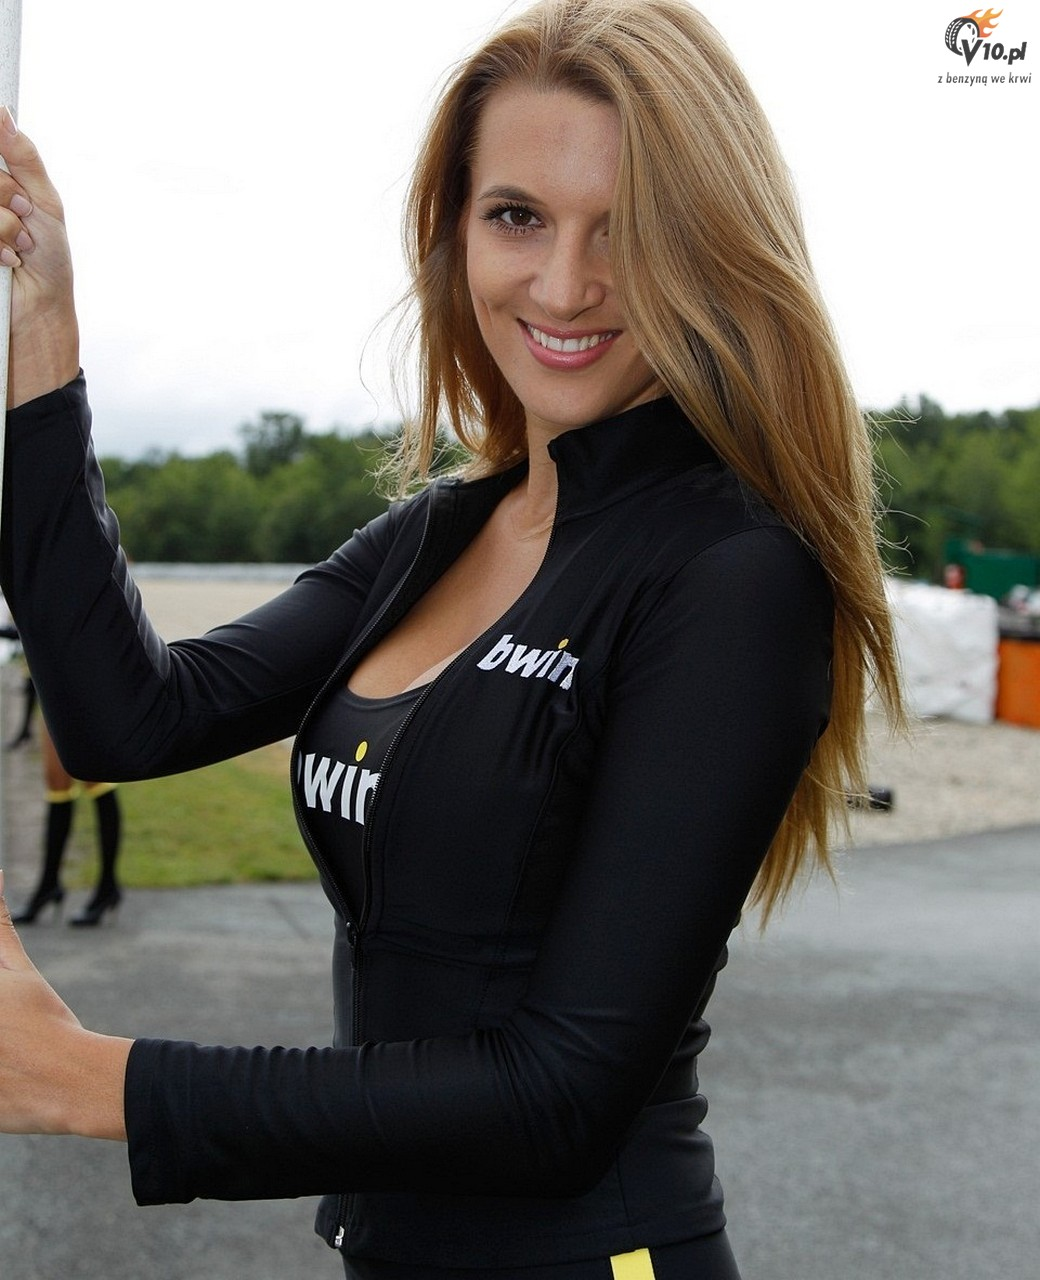 Motogp 2012 grid girls z padoku toru brno foto i wideo